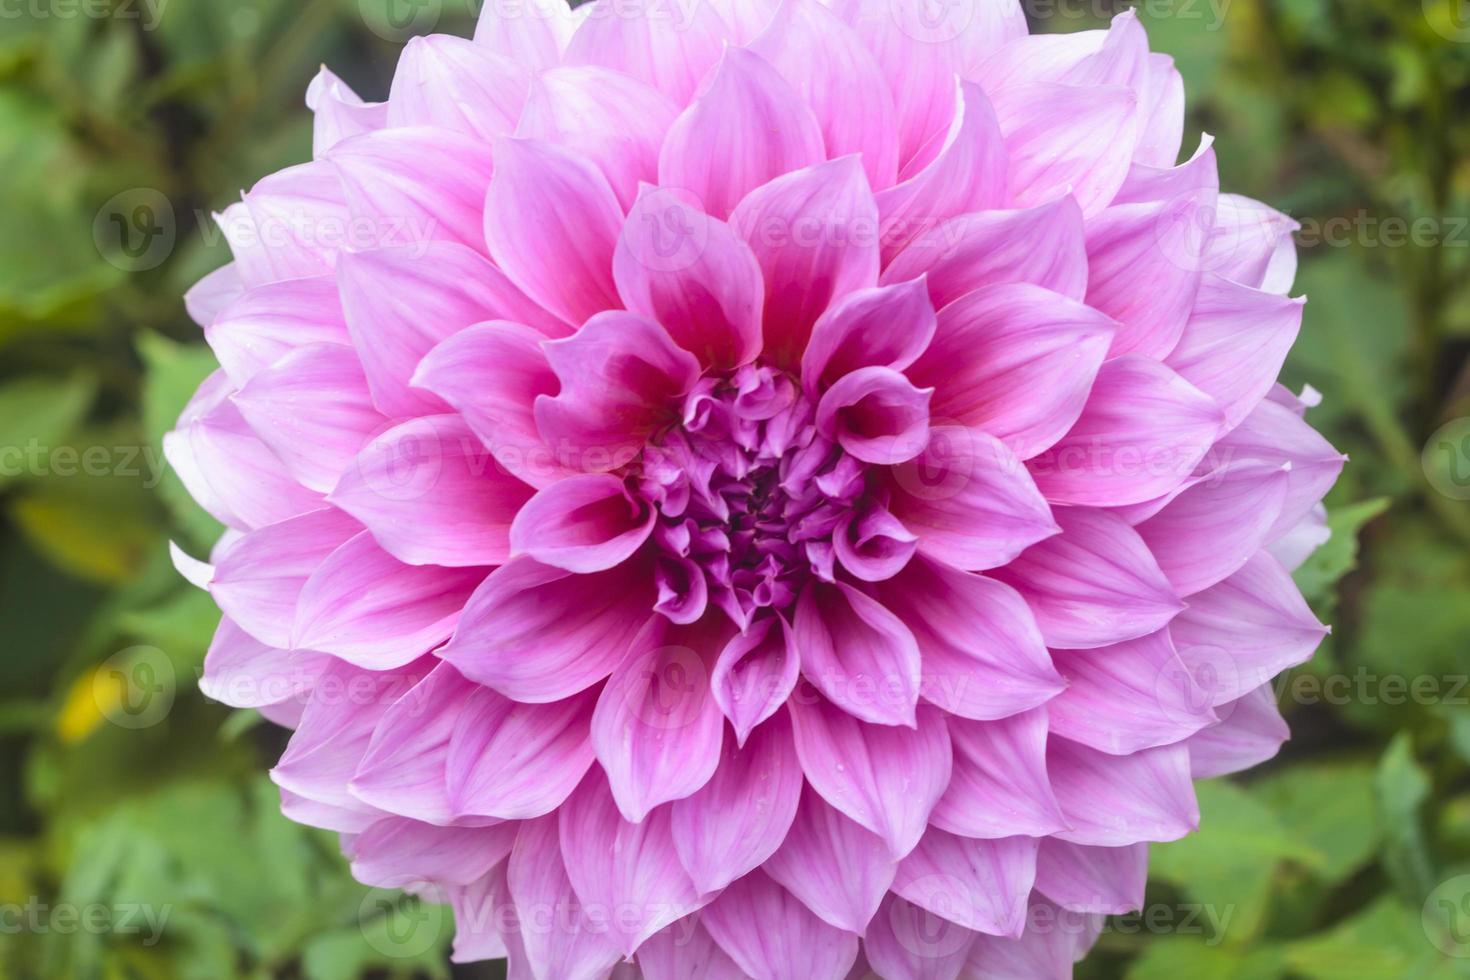 Dahlia Flowers photo